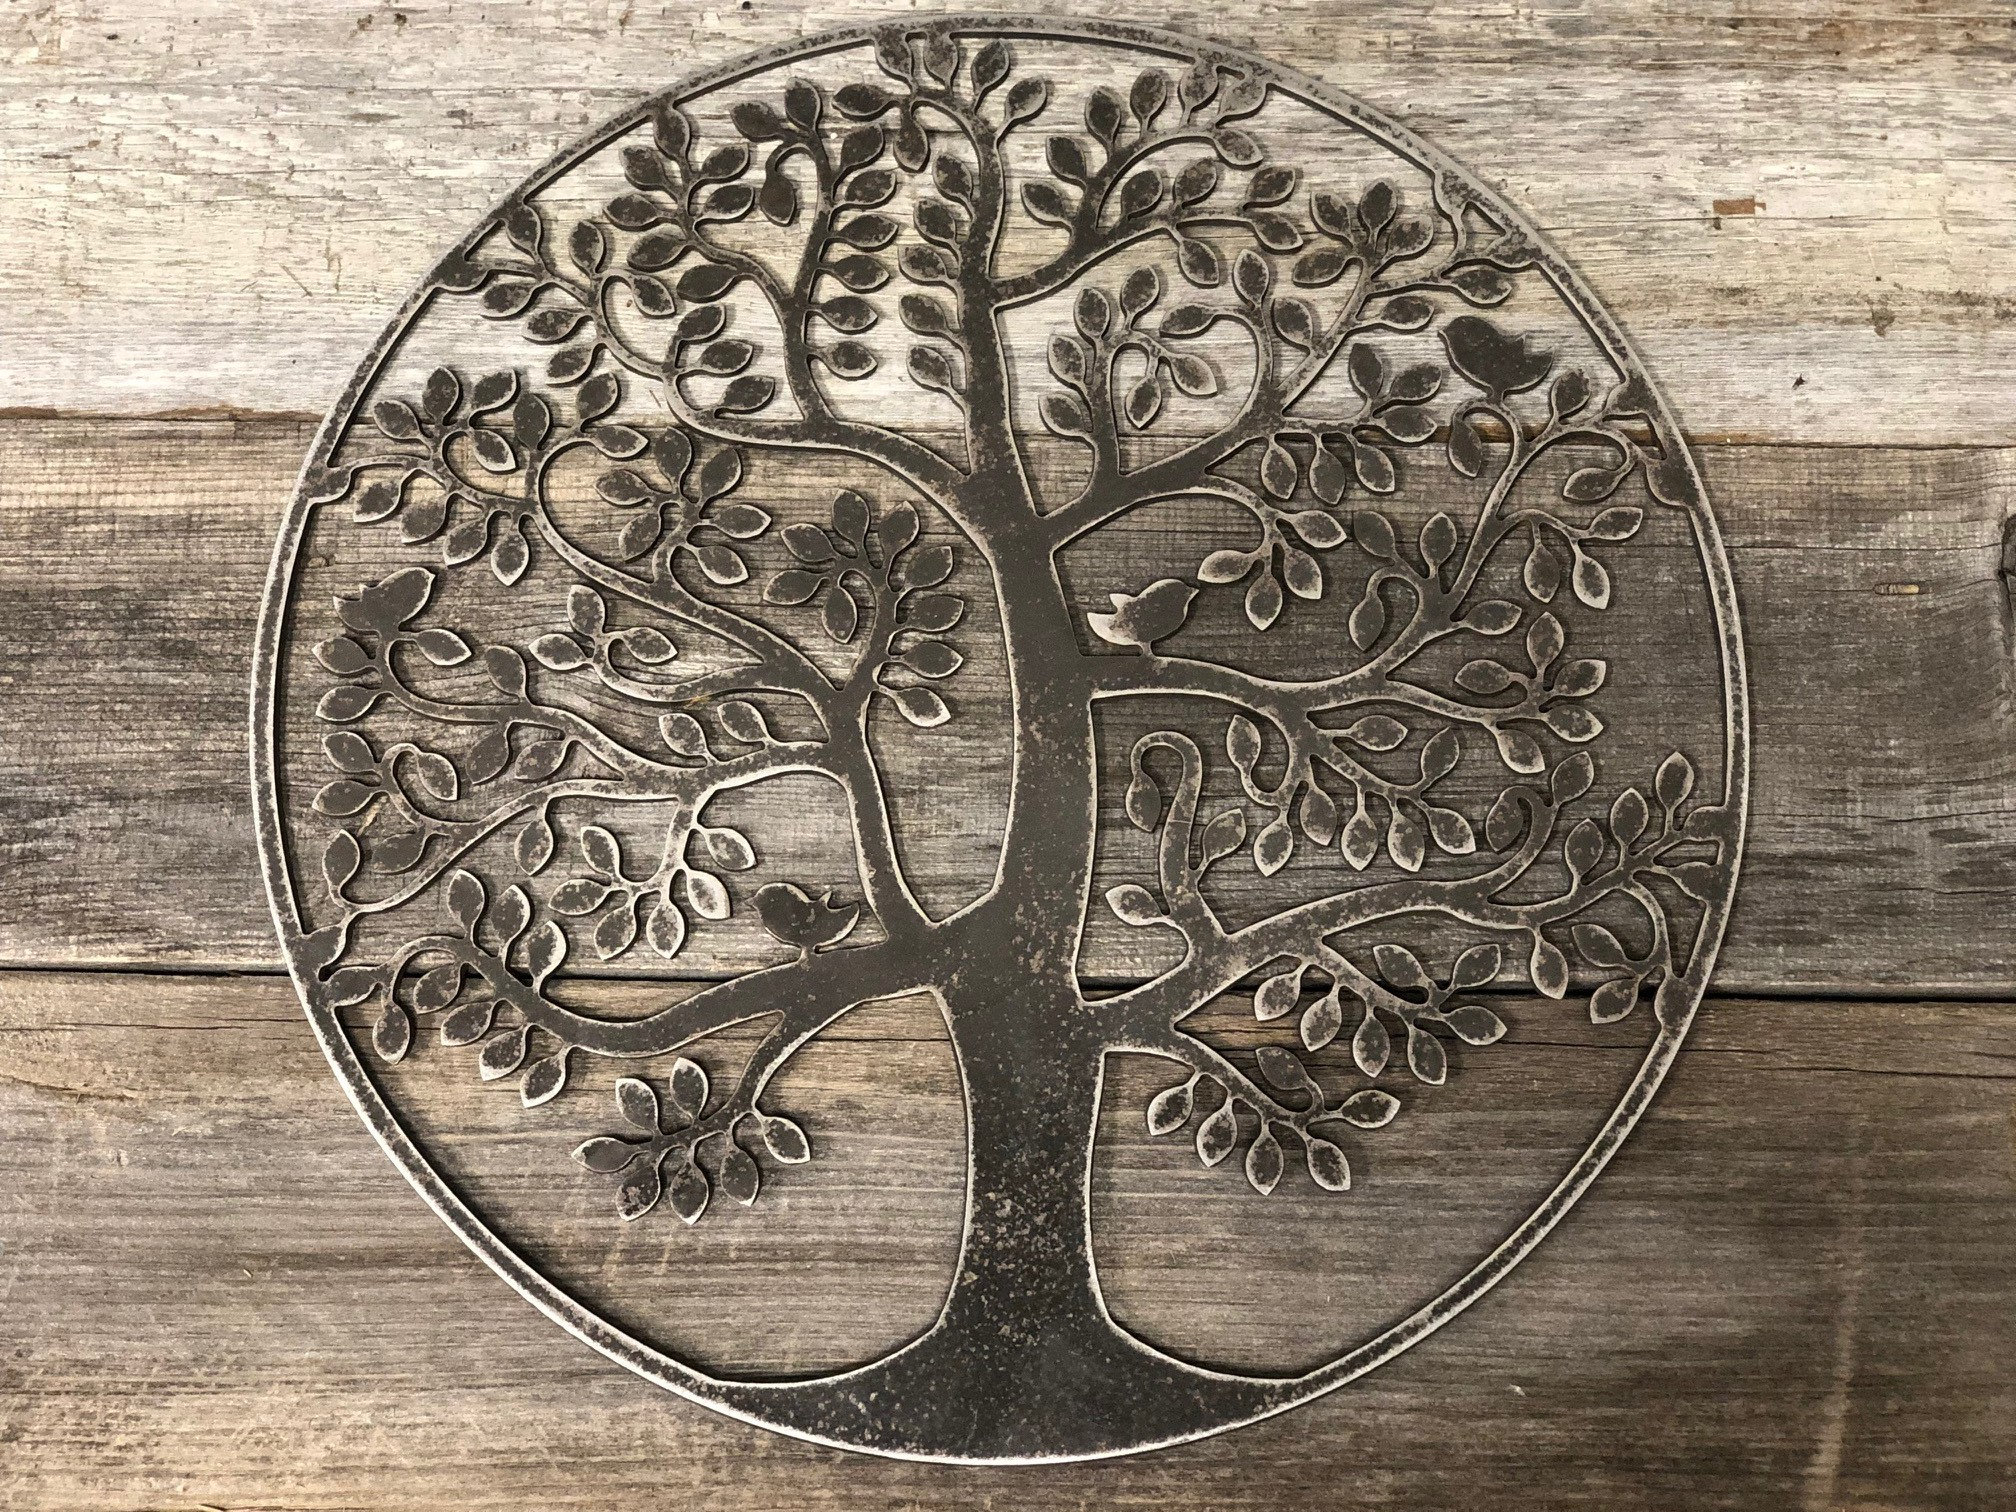 Metal Tree Of Life Wall Art, Metal Tree Of Life, Family Tree Wall Decor, Family, Metal Wall Art, Home Decor With Tree Of Life Wall Decor (View 23 of 30)